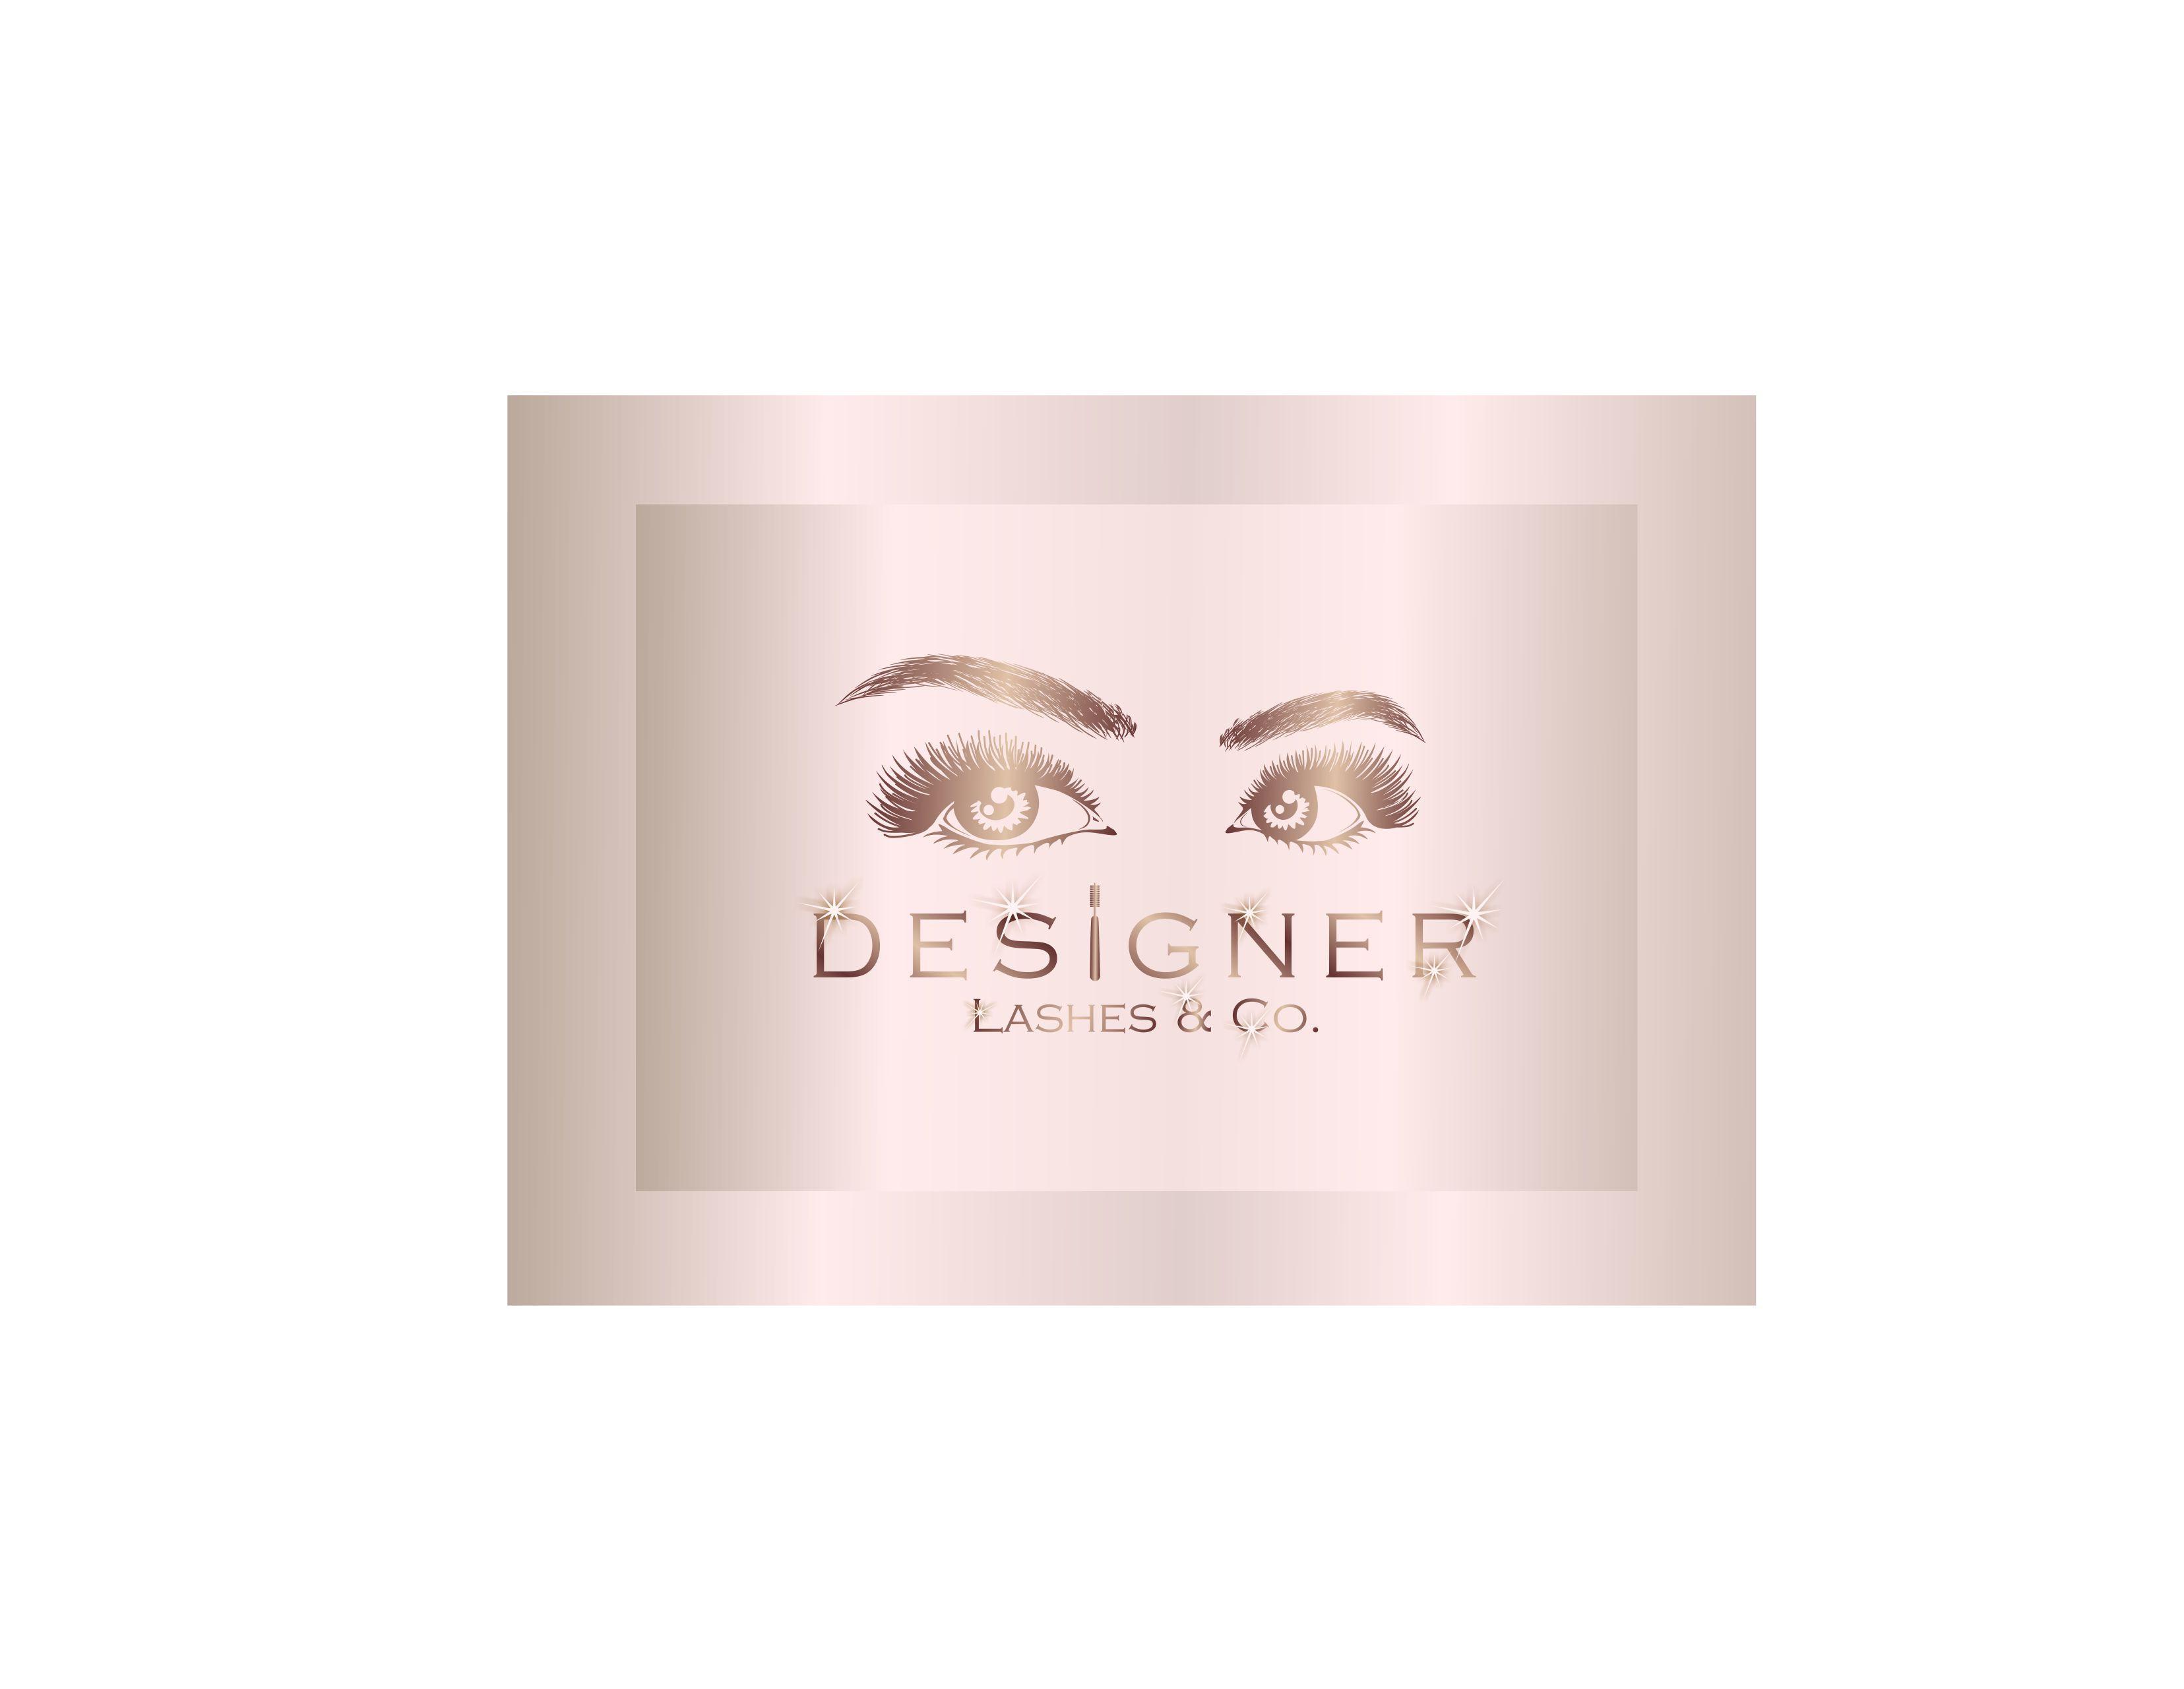 Eye lash extension business logo